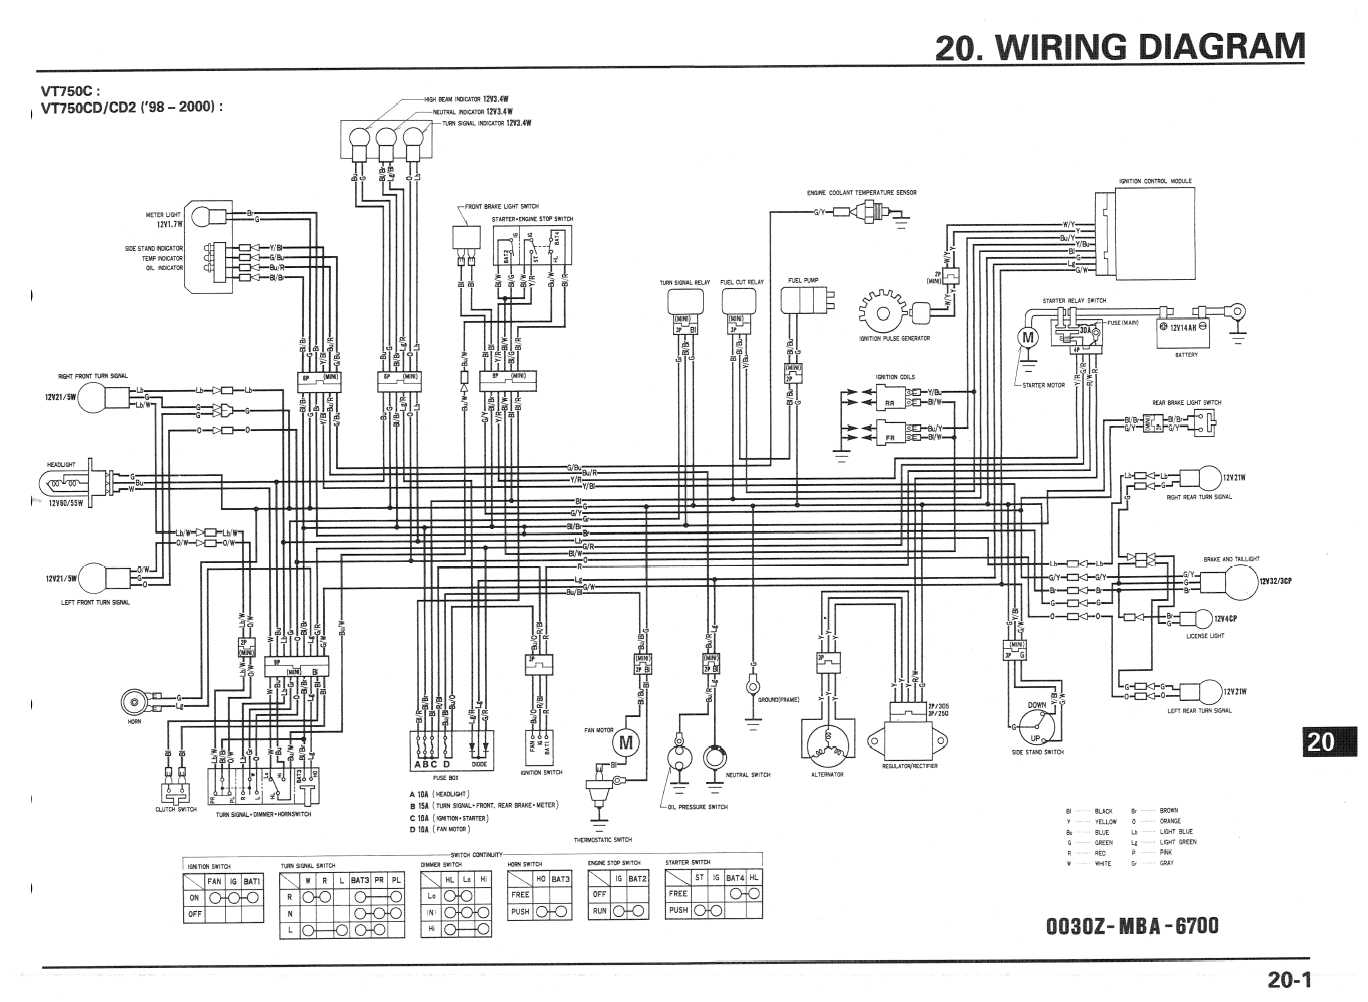 OZ_6907] 1986 Honda Shadow 1100 Wiring Diagram Also 1994 Honda Shadow 1100  Wiring DiagramNorab Istic Xortanet Capem Mohammedshrine Librar Wiring 101